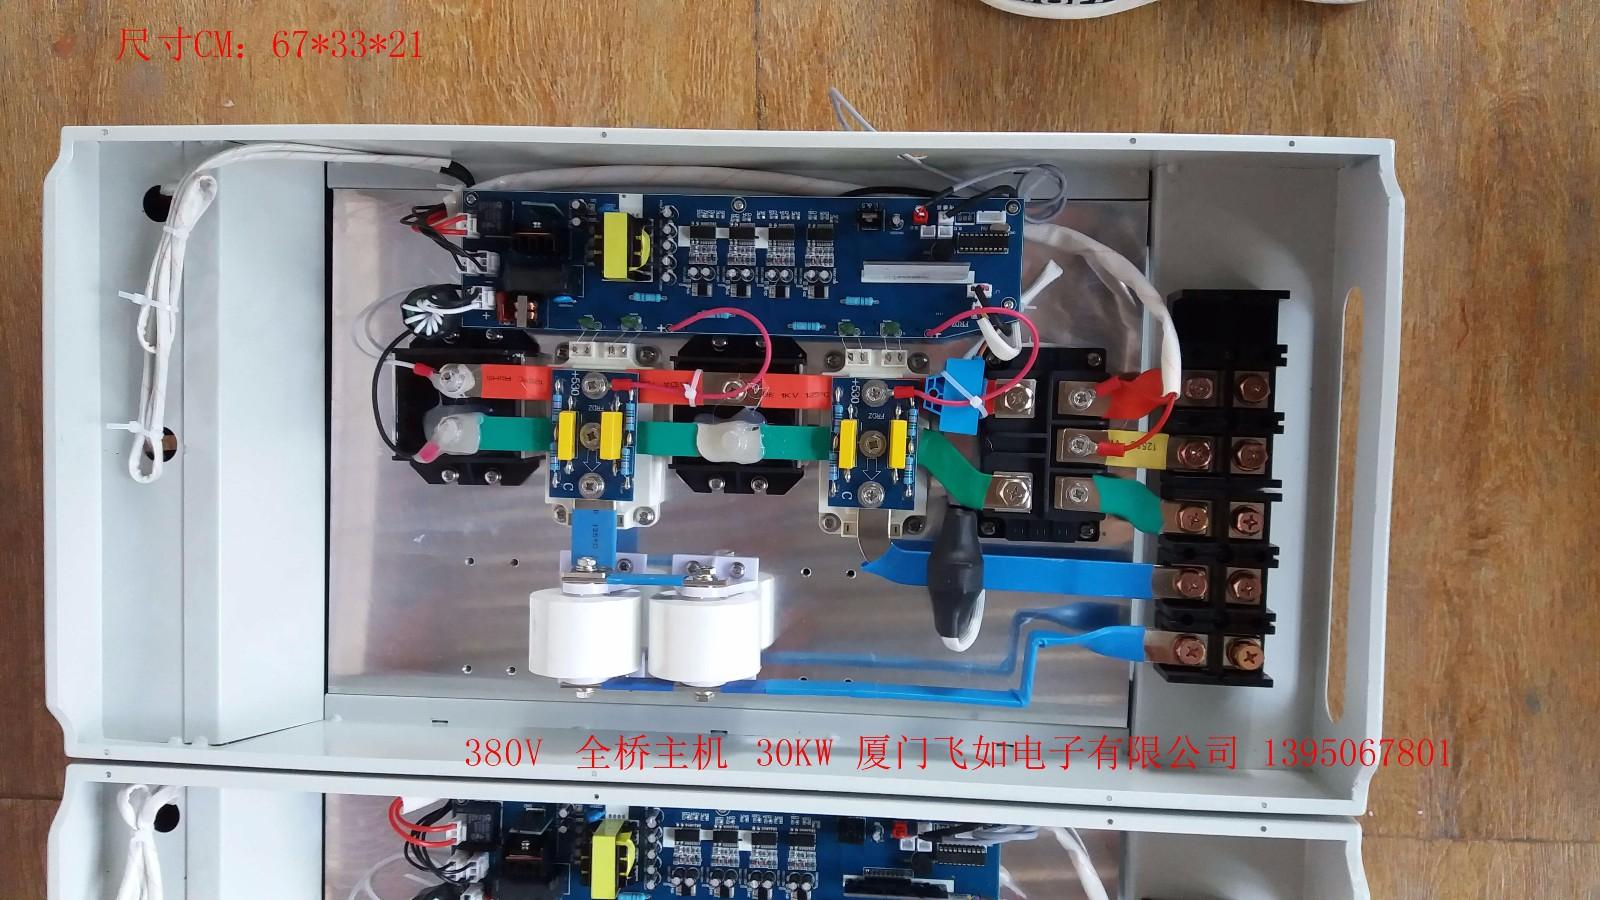 380V 30KW电磁加热主机